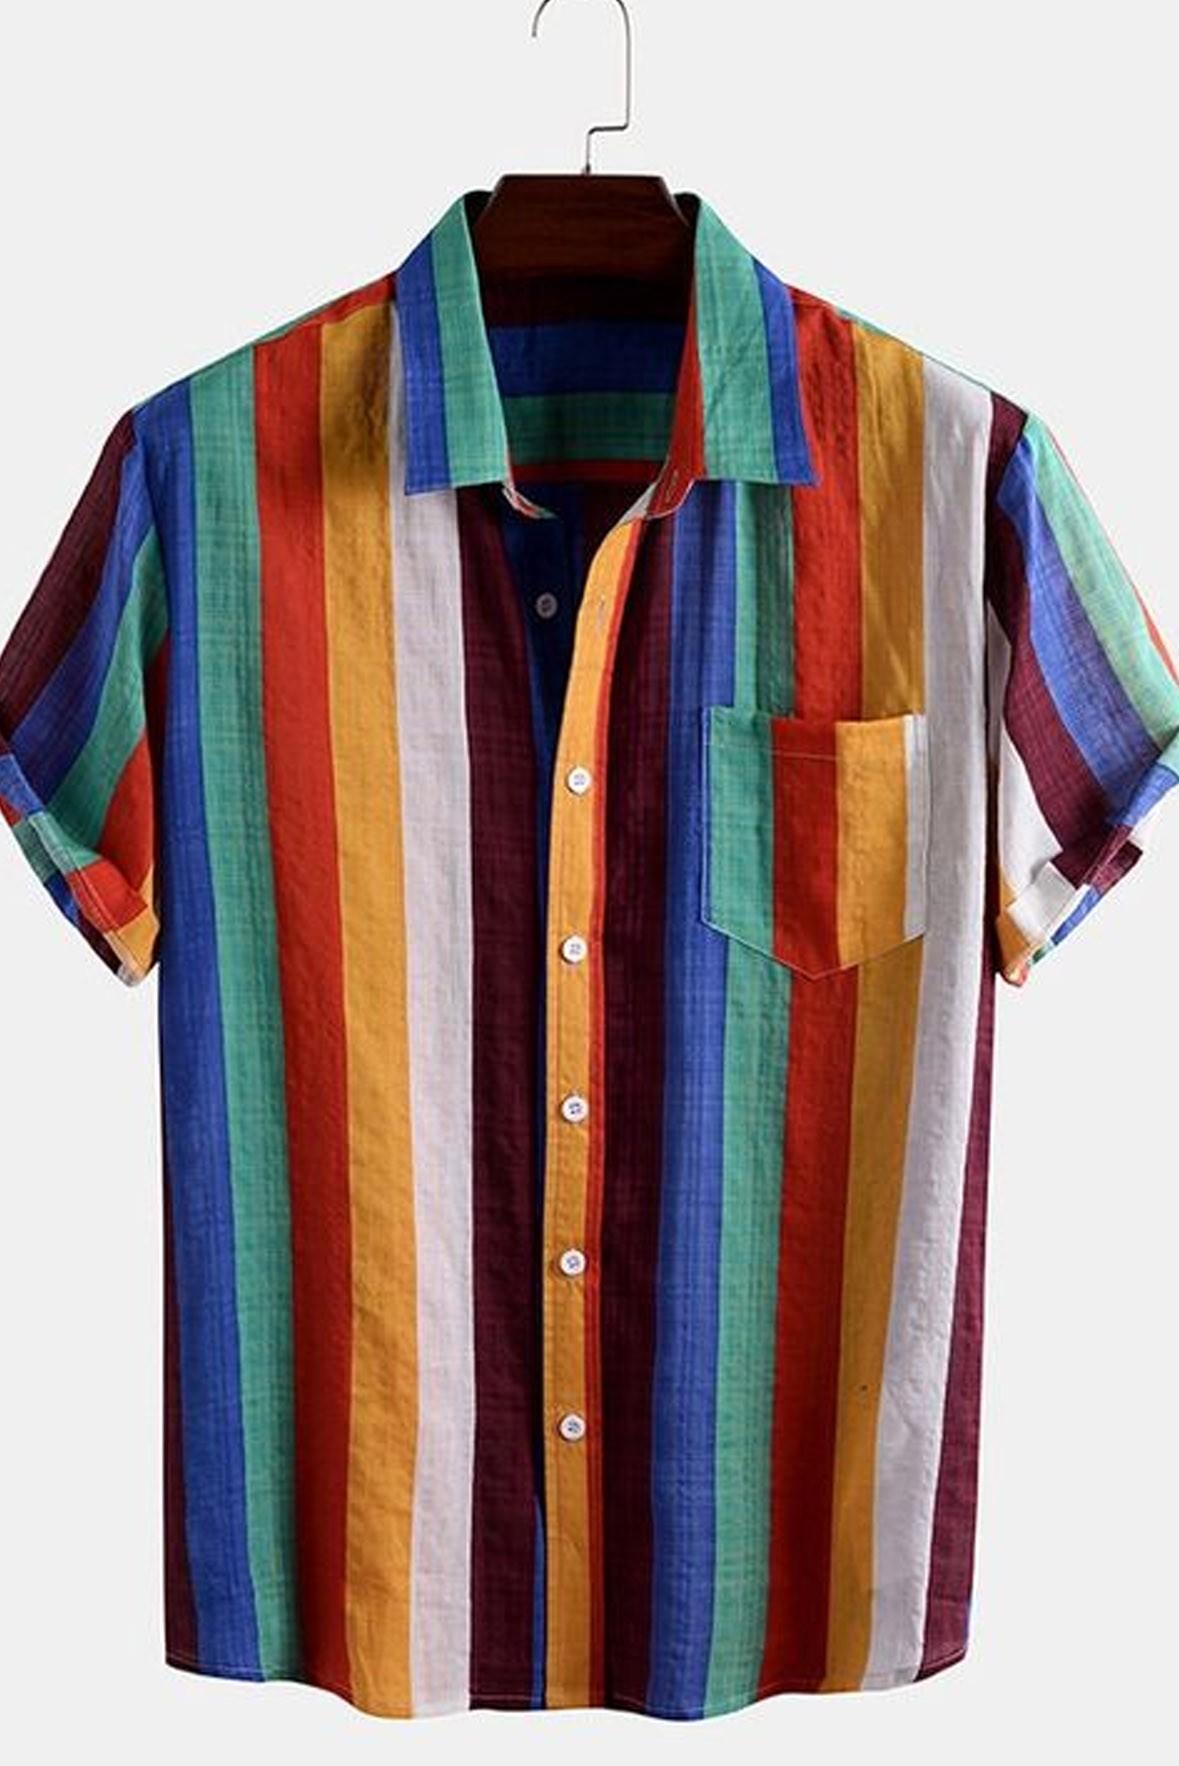 Men Colorful Striped Shirt